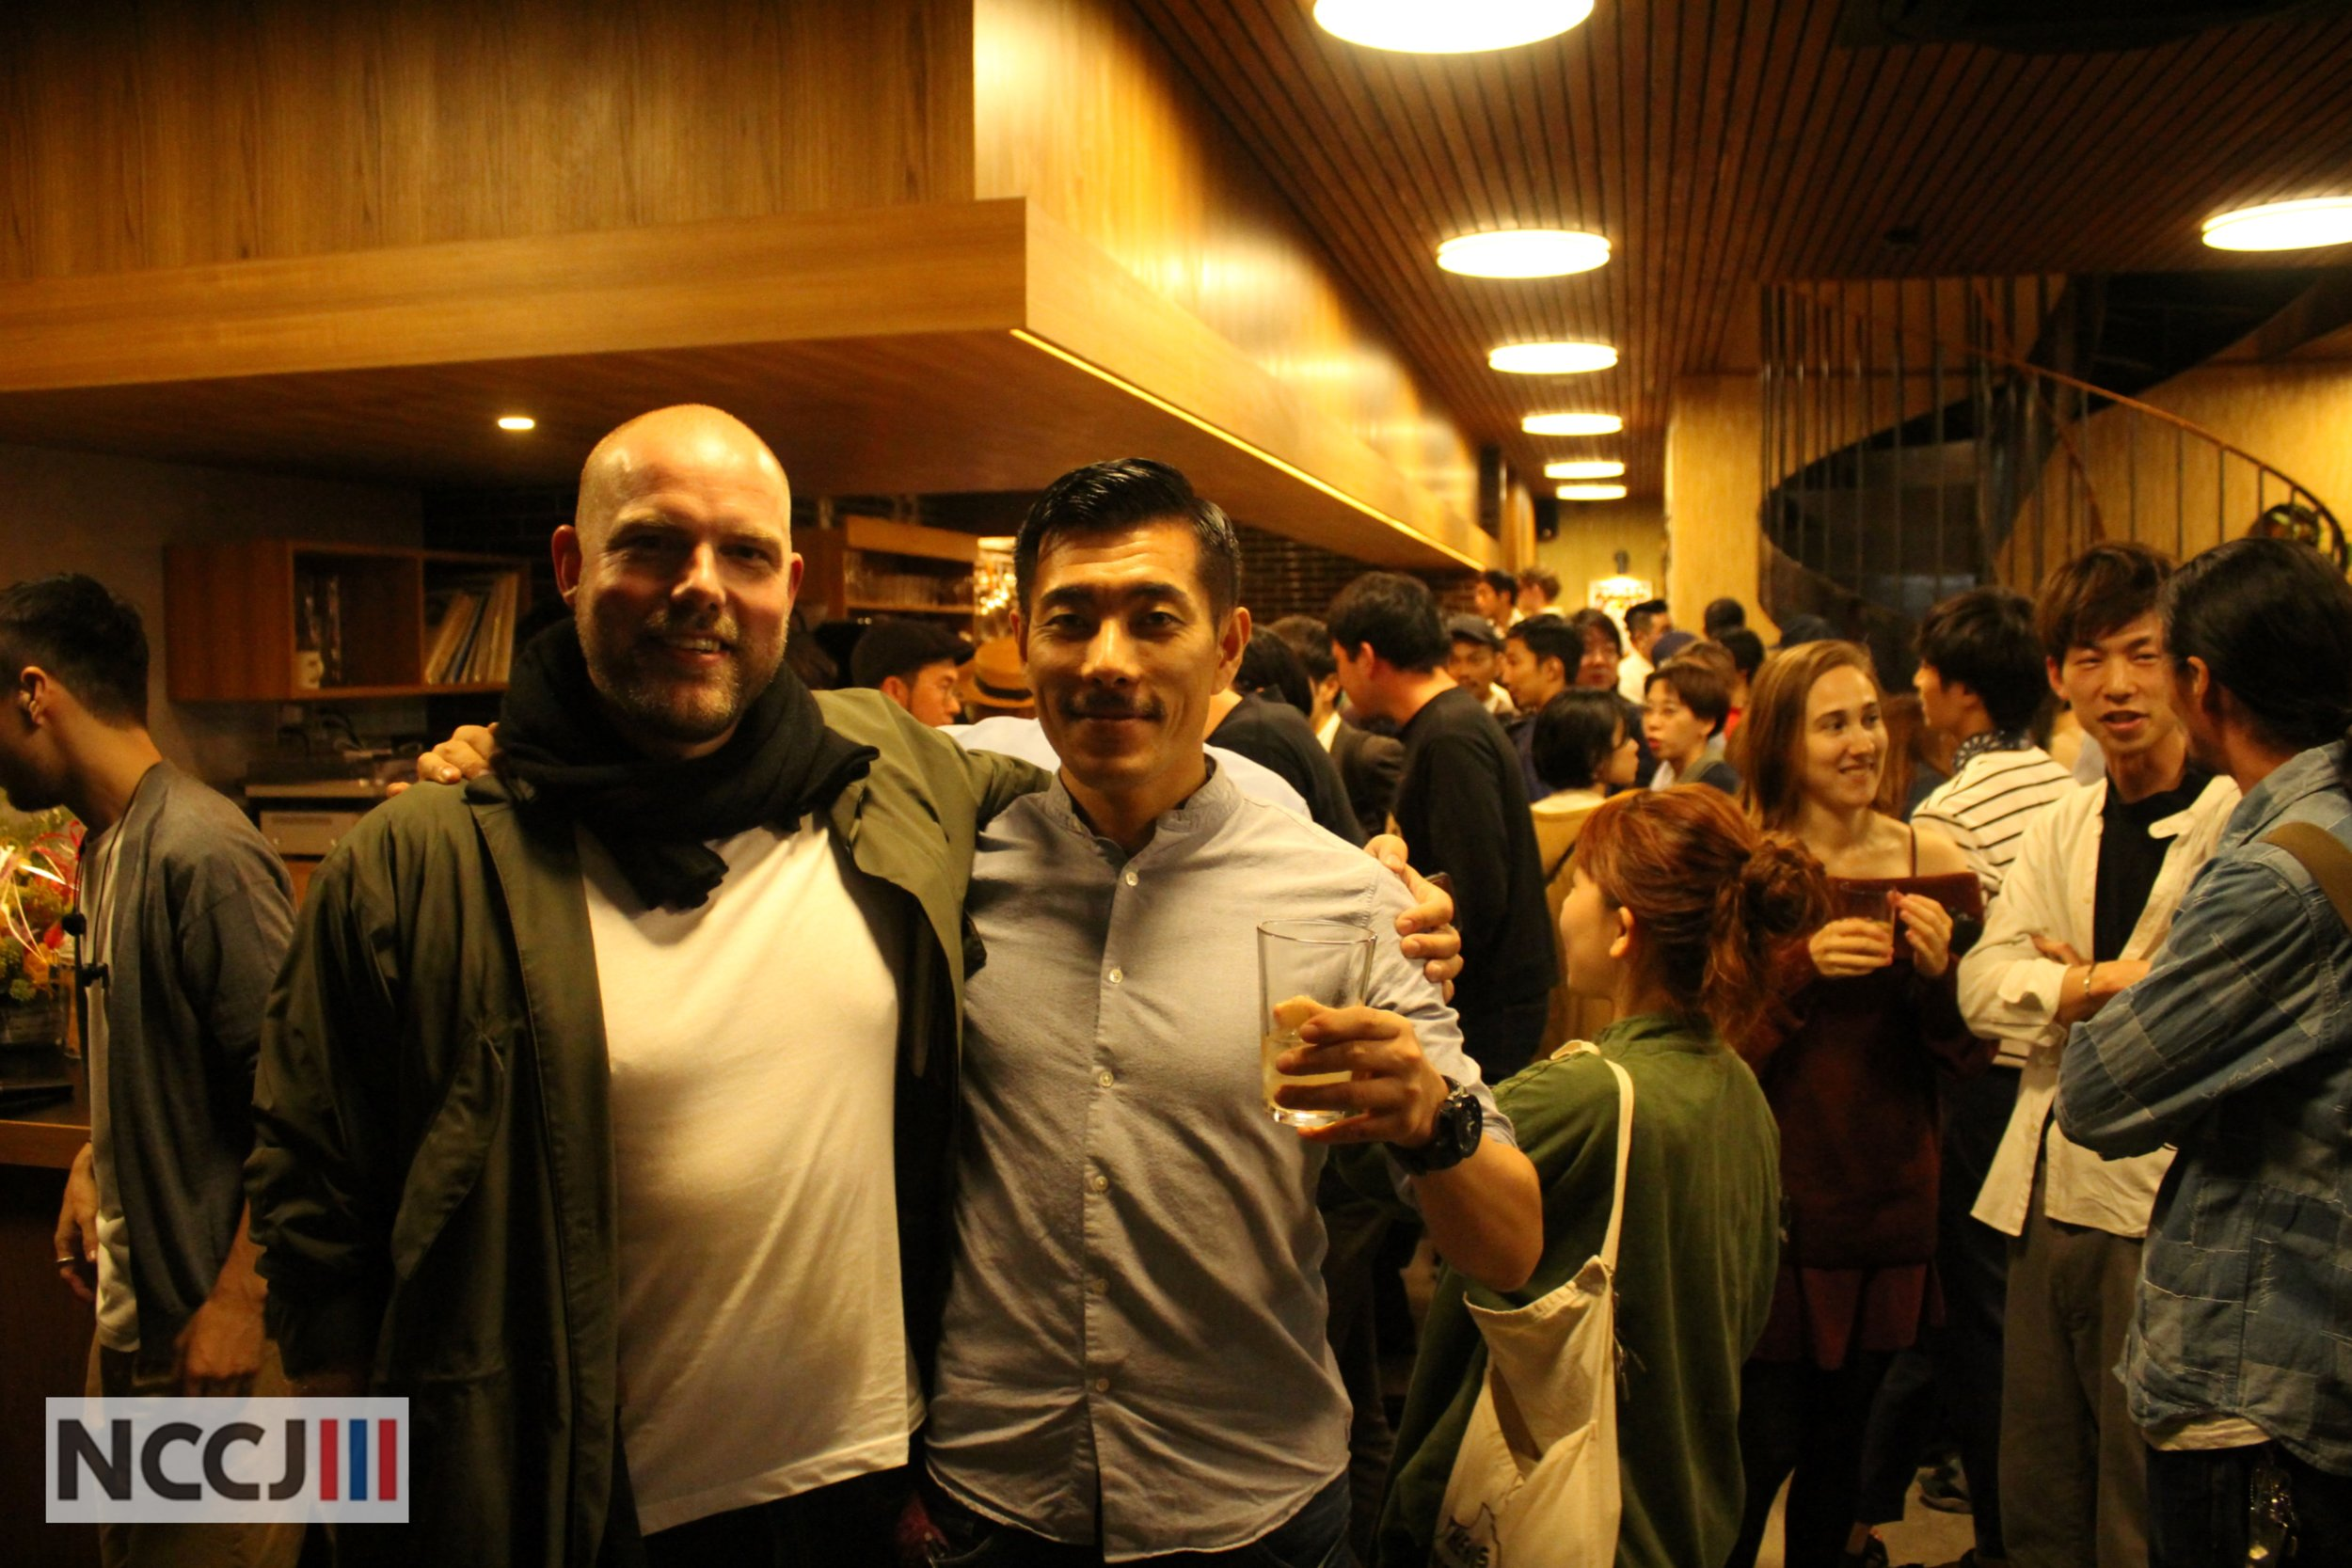 Einar Kleppe Holthe together with Japan's General Manager Kenji Kojima